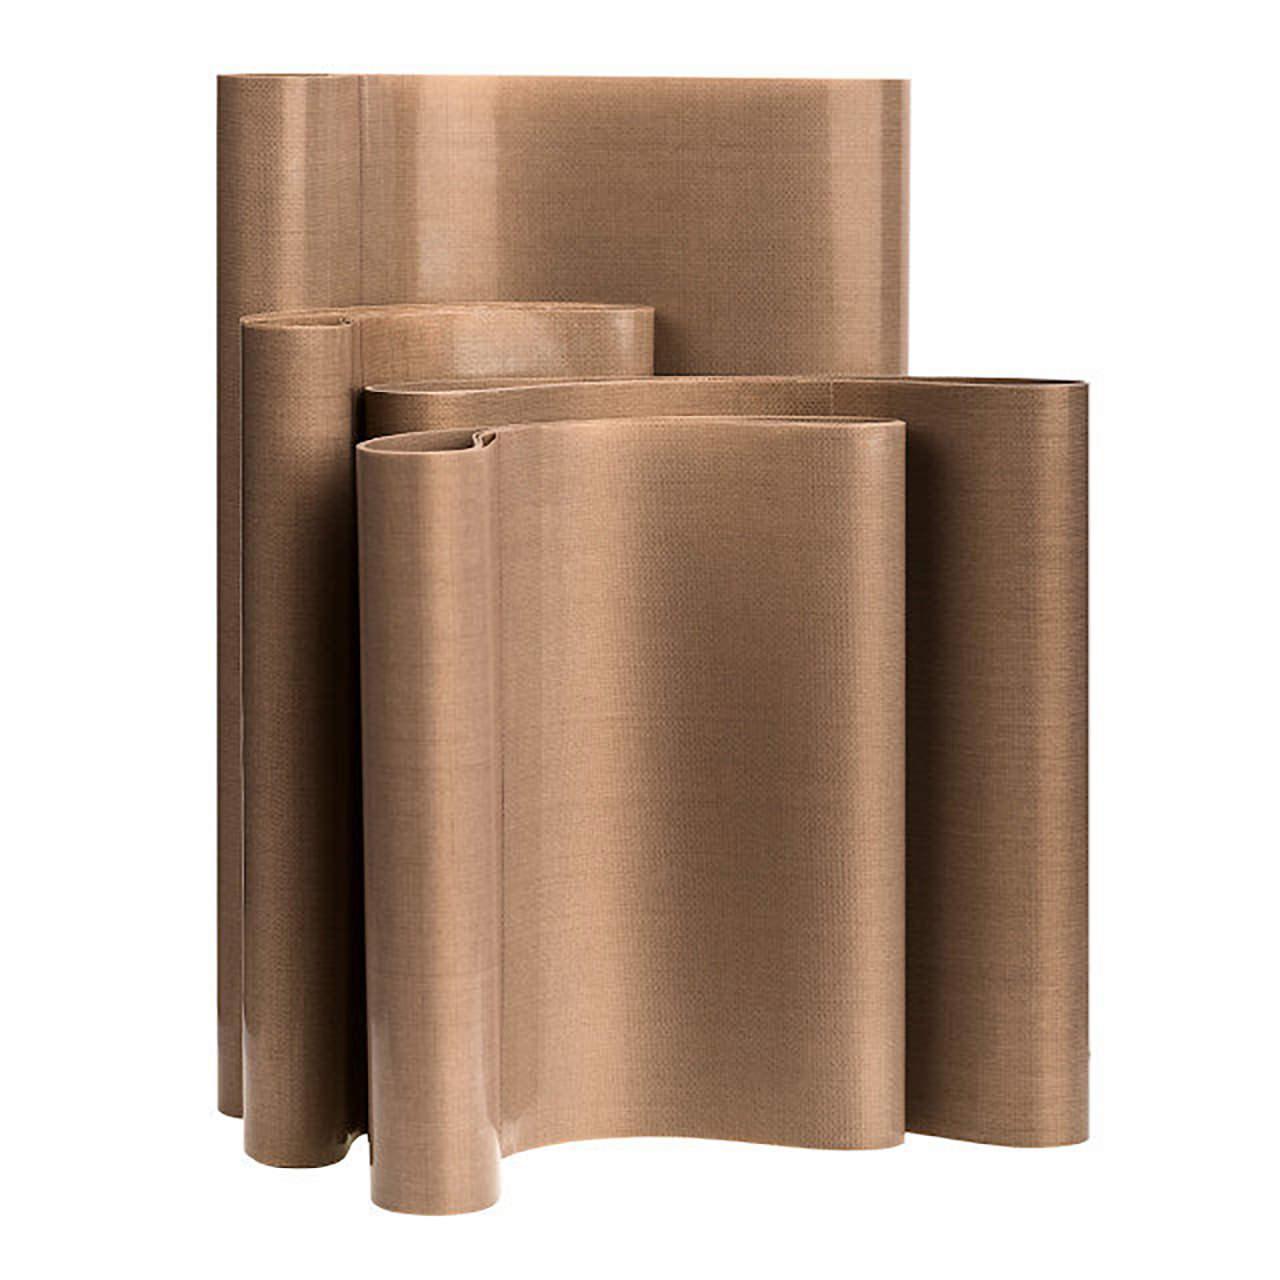 Тефлоновый ремень 230х500 мм для сварки ПВХ